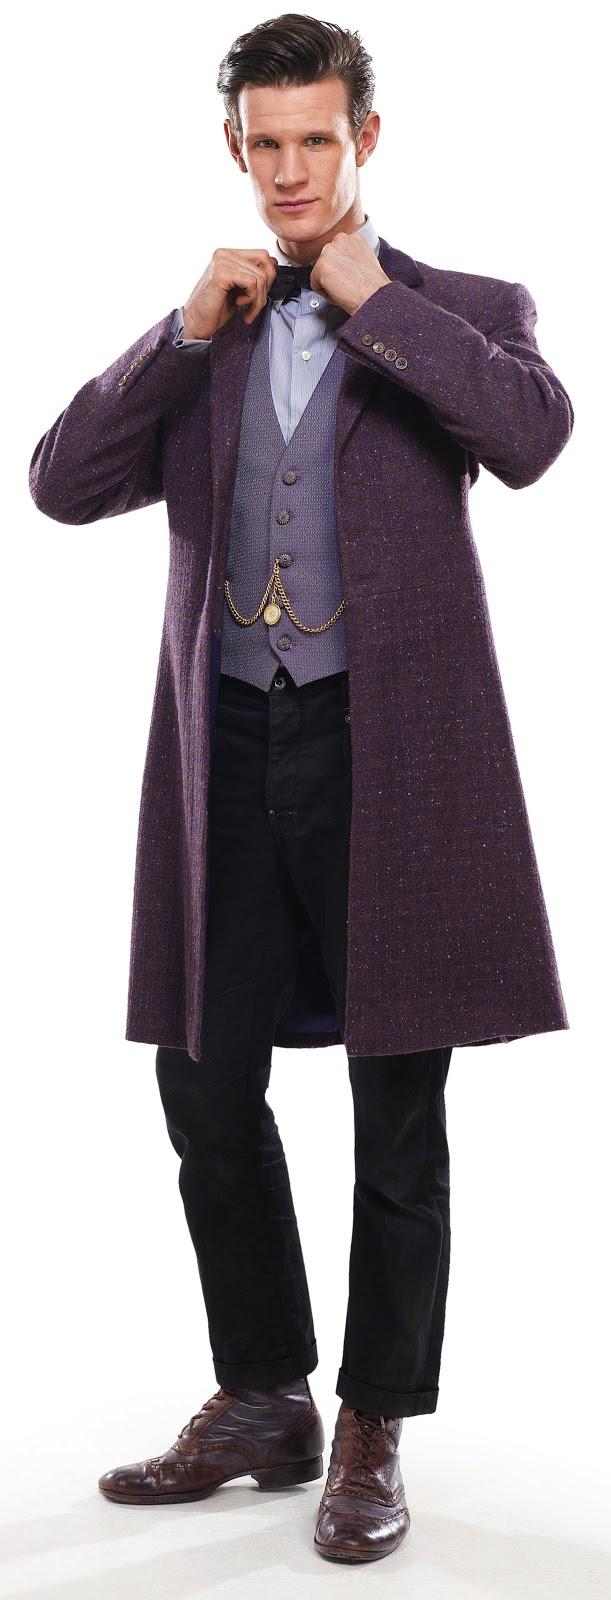 Making My 11th Doctor Costume: The Bells Of Saint John - costume ...